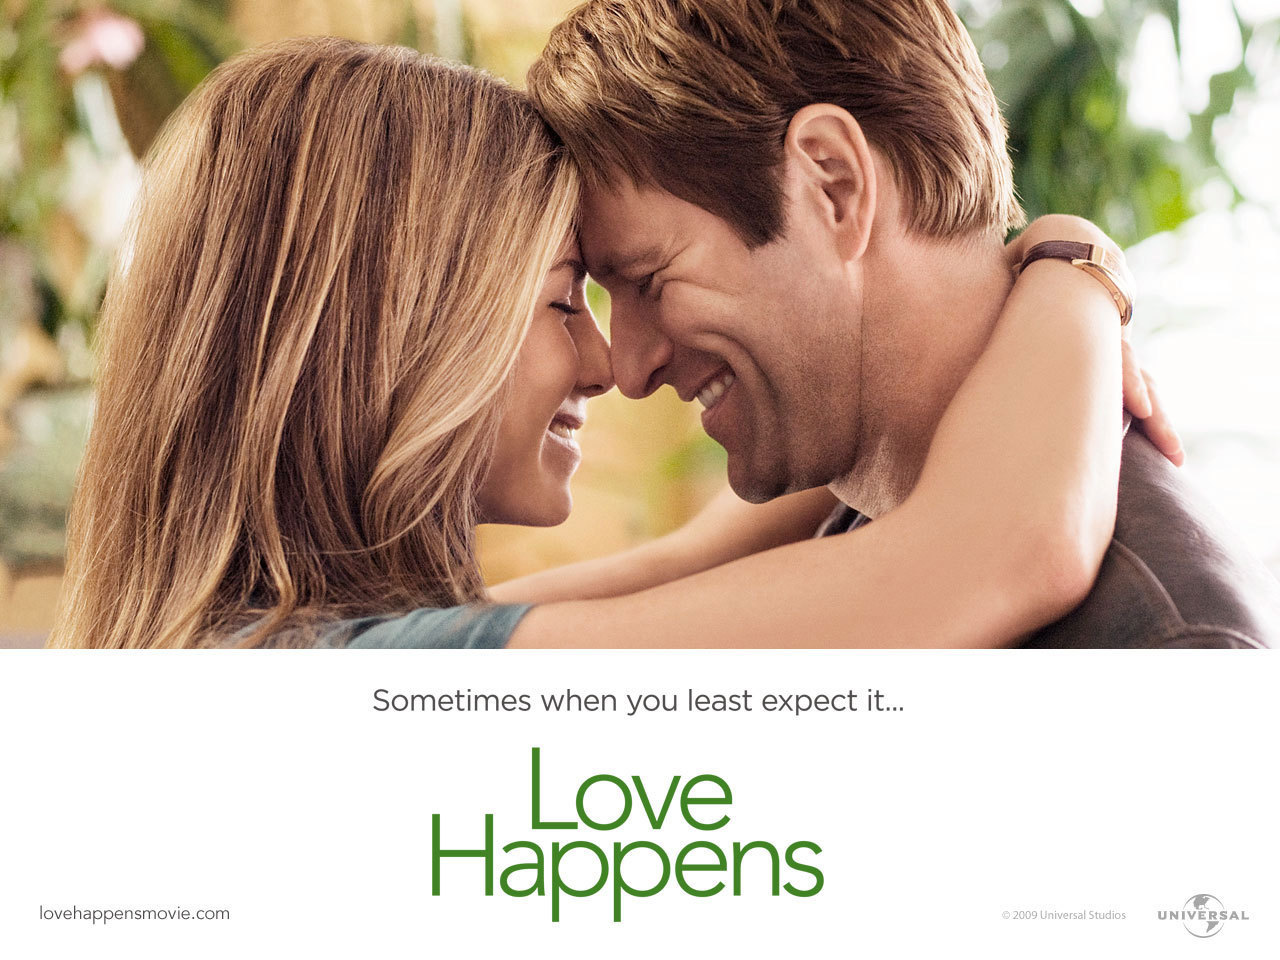 Love Happens :ถึงชีวิตจะสูญเสีย…แต่อยาให้ใจเสียศูนย์